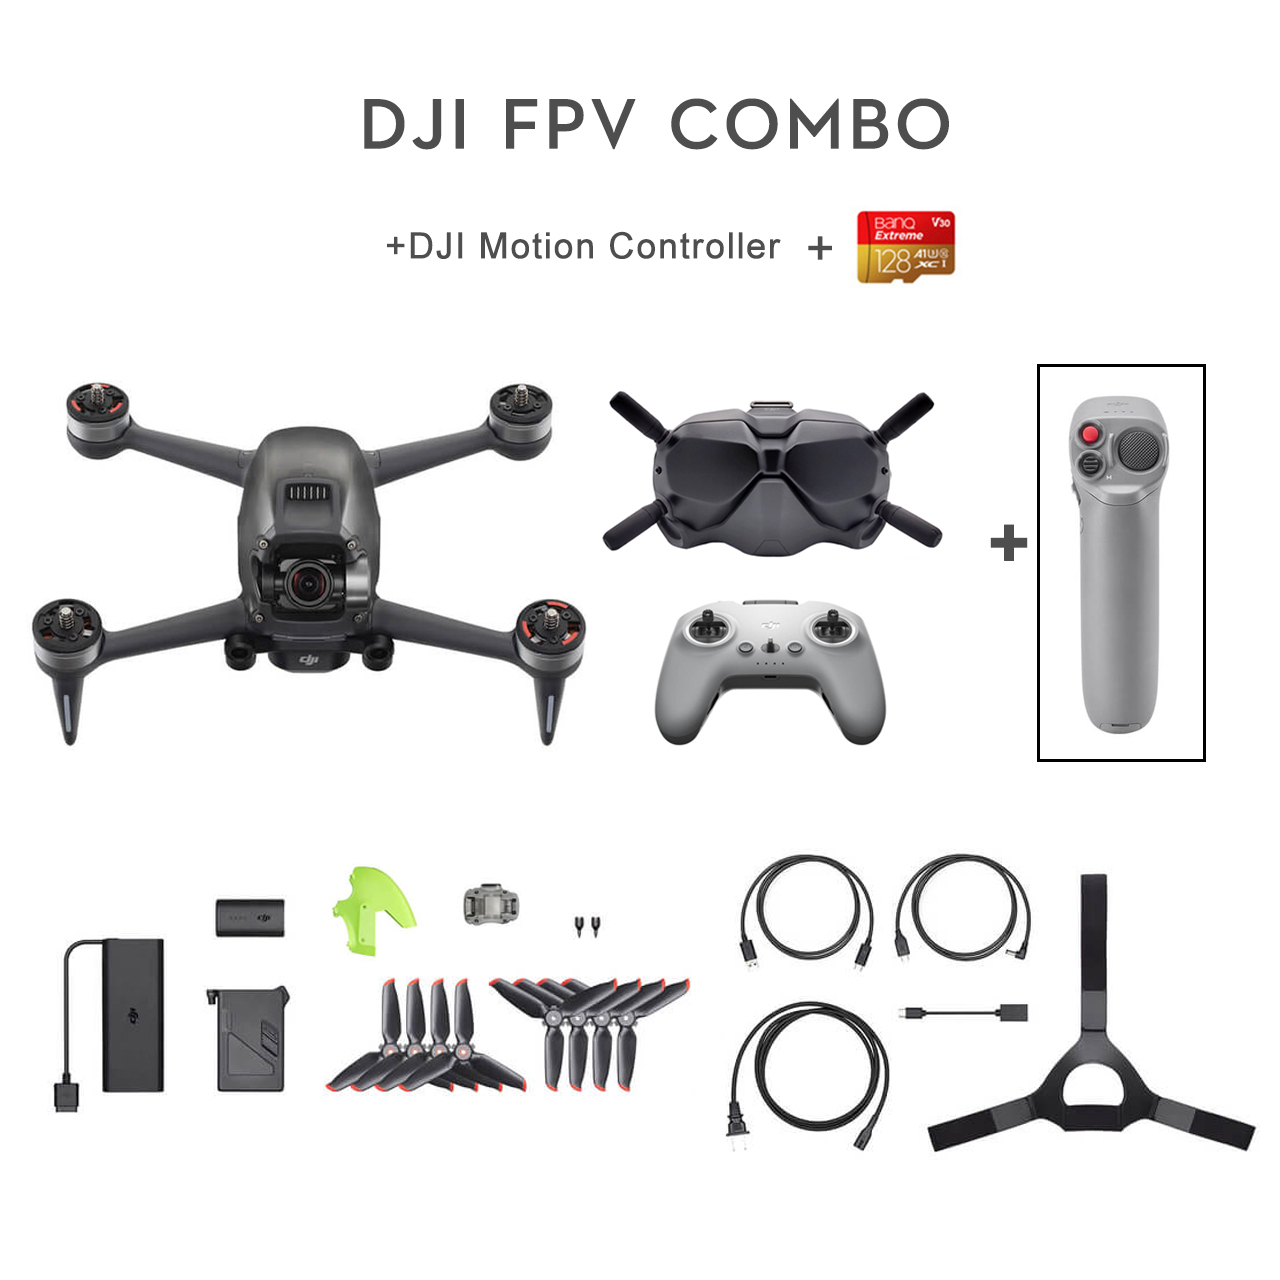 DJI FPV COMBO 4K/60fps Super Wide 150° FOV 10km Video Transmission included FPV Goggles V2 FPV Drone original brand new in stock|Camera Drones| - AliExpress